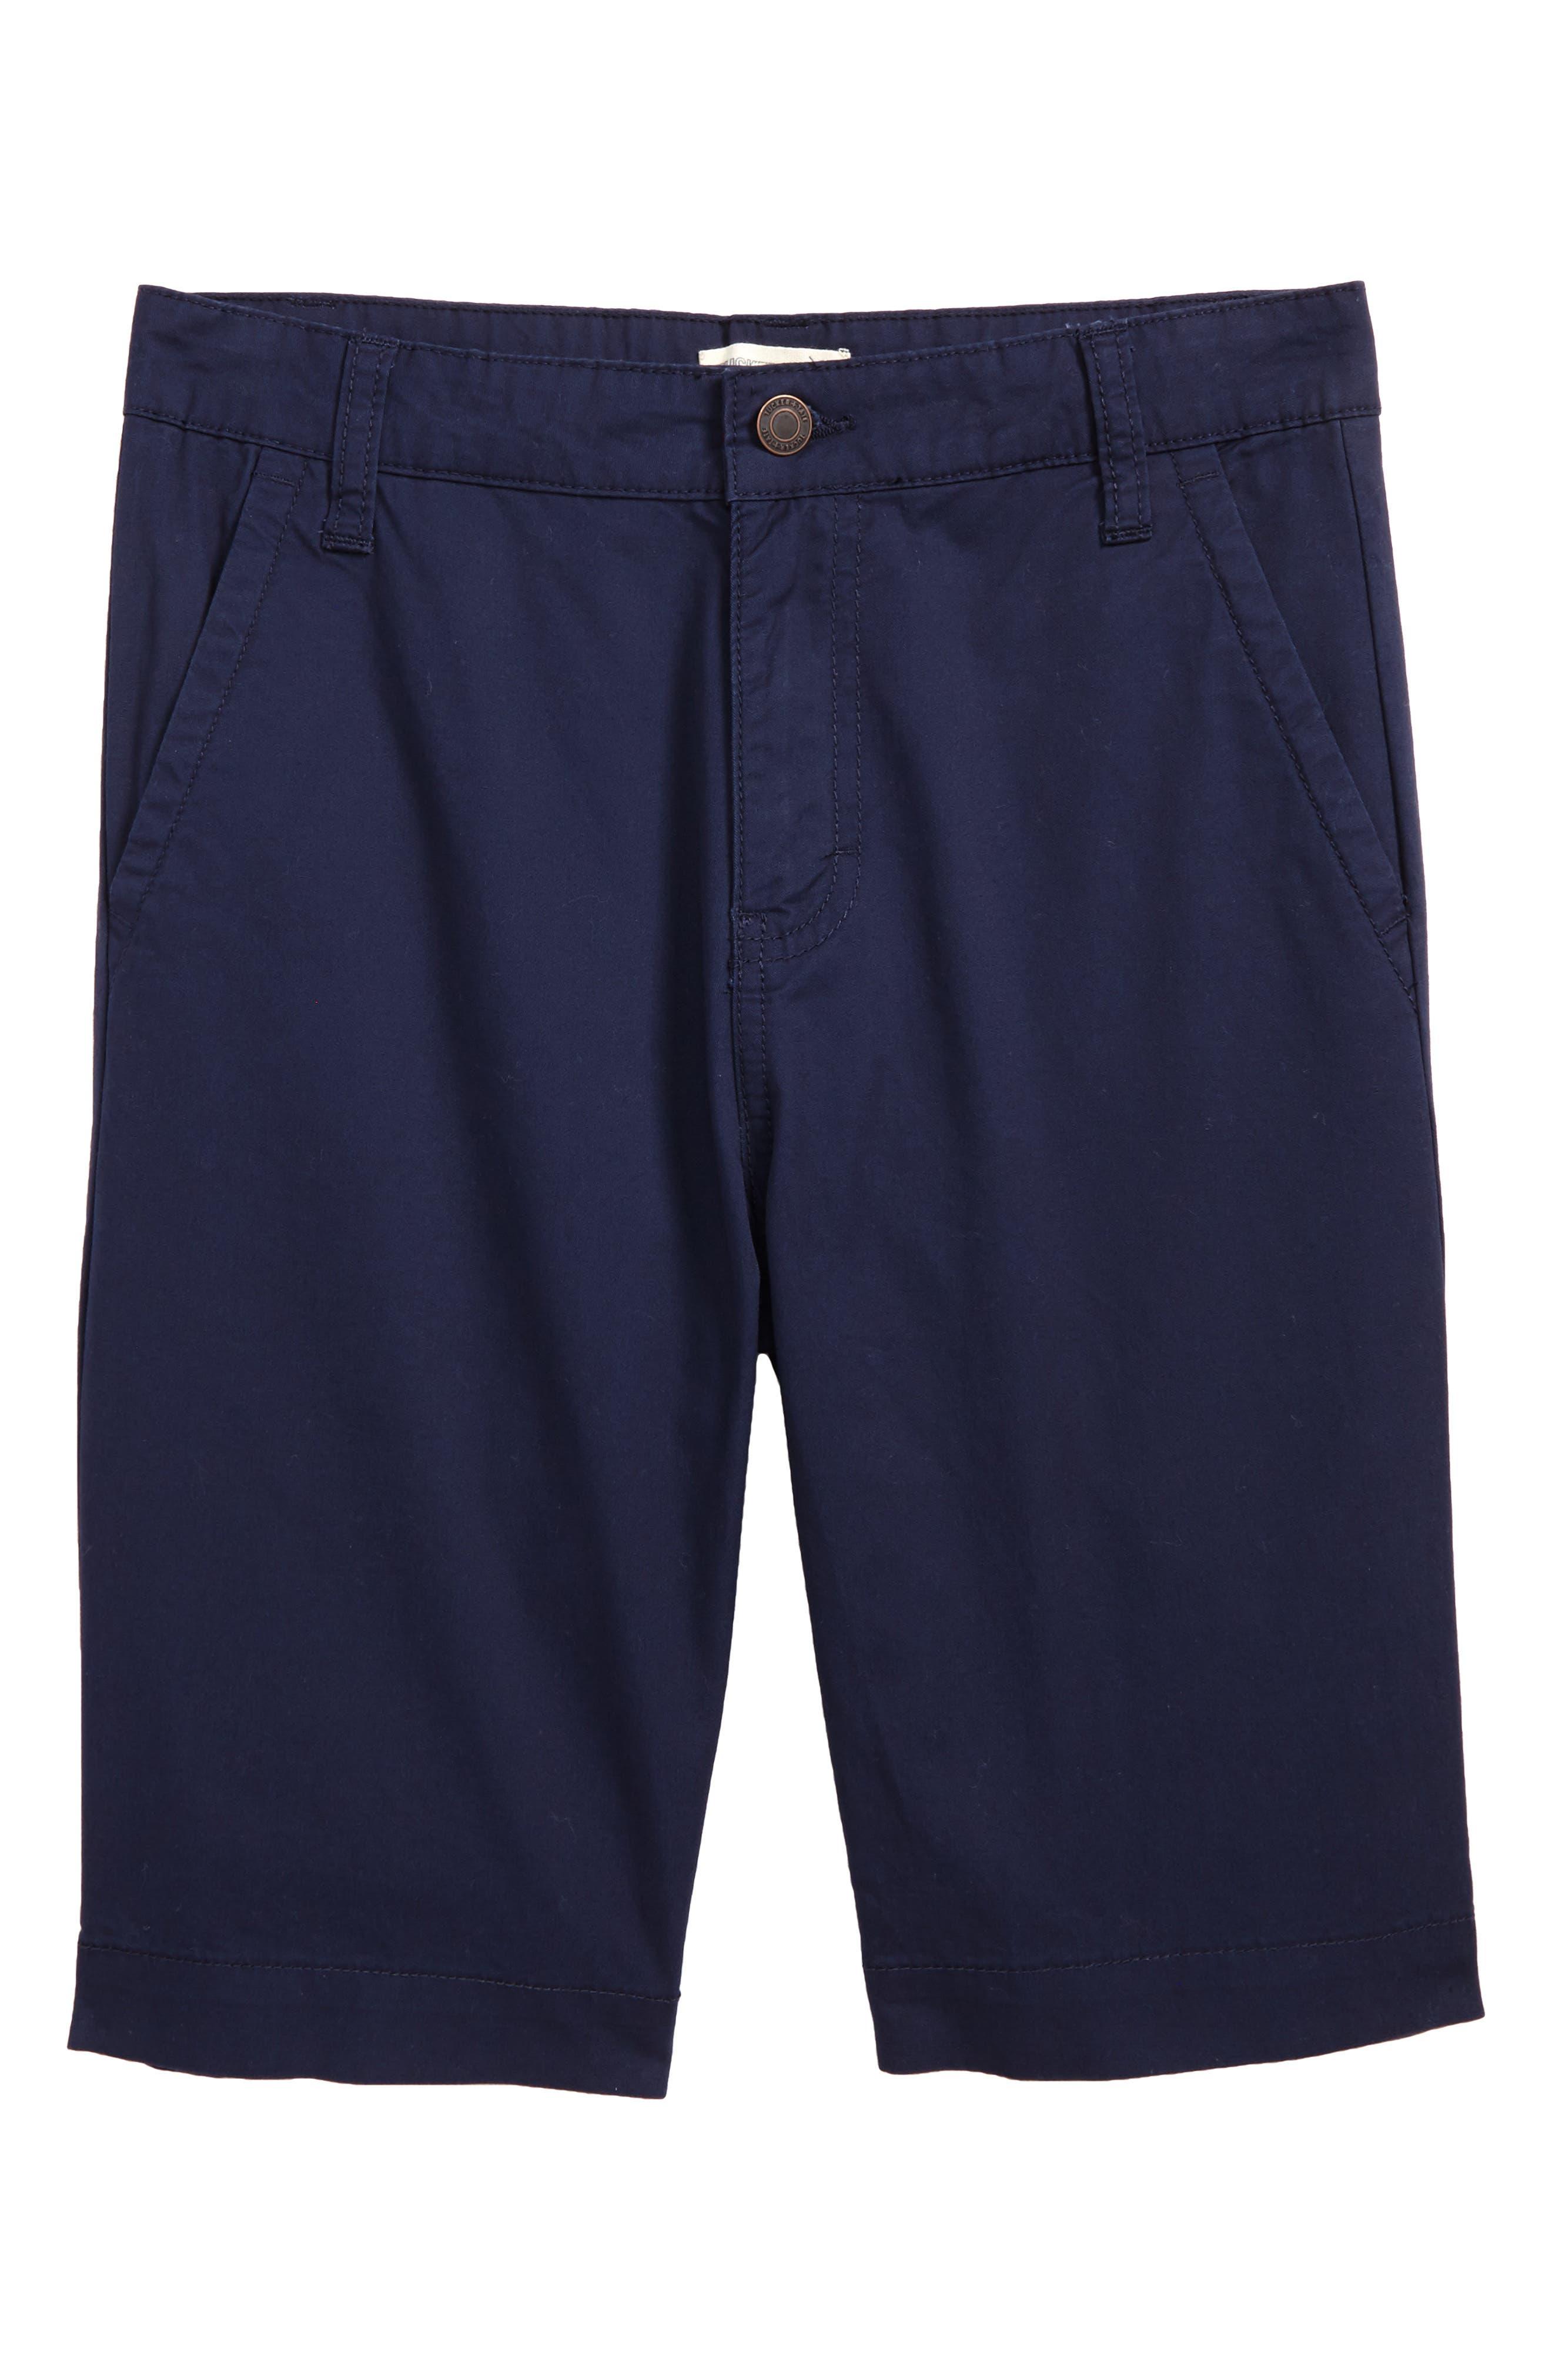 Alternate Image 1 Selected - Tucker + Tate Chino Shorts (Big Boys)